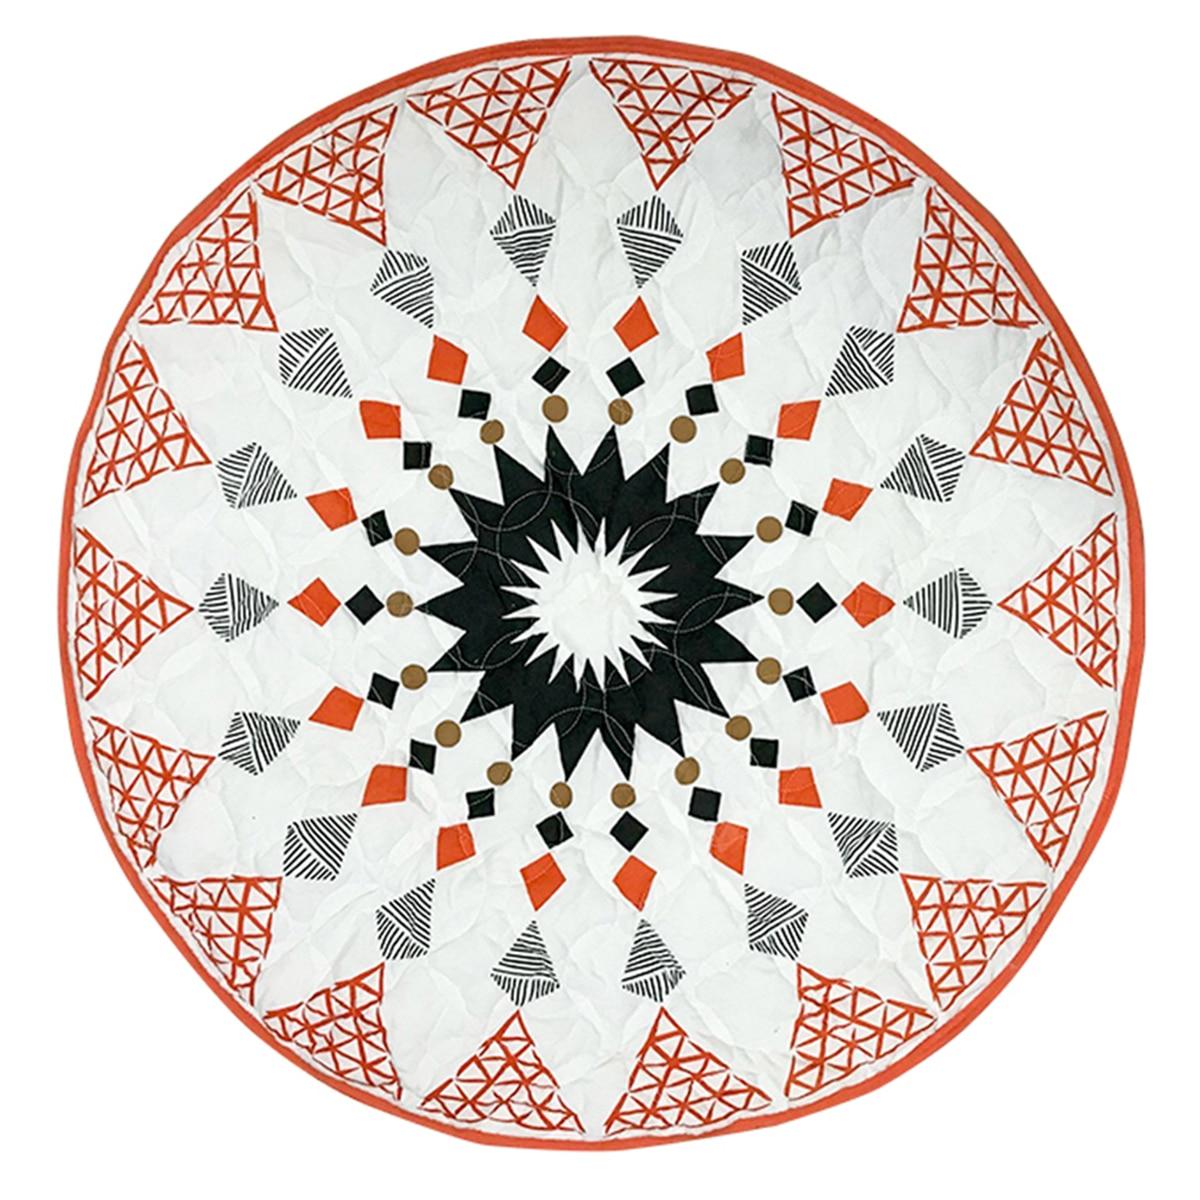 New Geometric Lozenge Pattern Baby Crawling Mat Children's Room Decoration Play Mat Moroccan Style Baby Mat